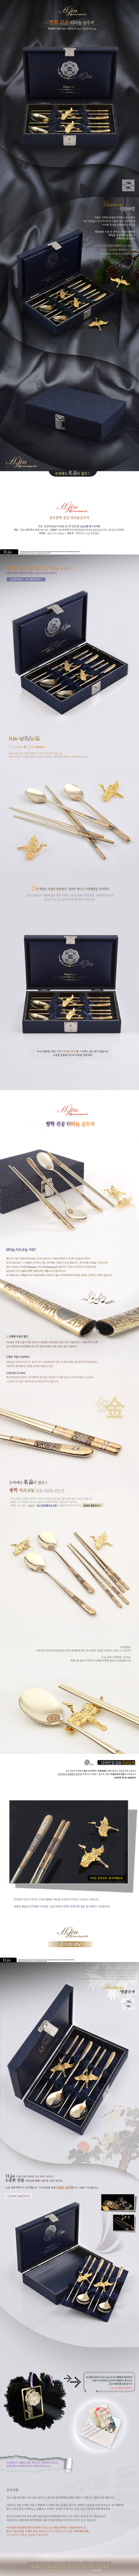 H.jin 쌍학진공티타늄금수저세트 - 현진통상, 201,600원, 숟가락/젓가락/스틱, 숟가락/젓가락 세트